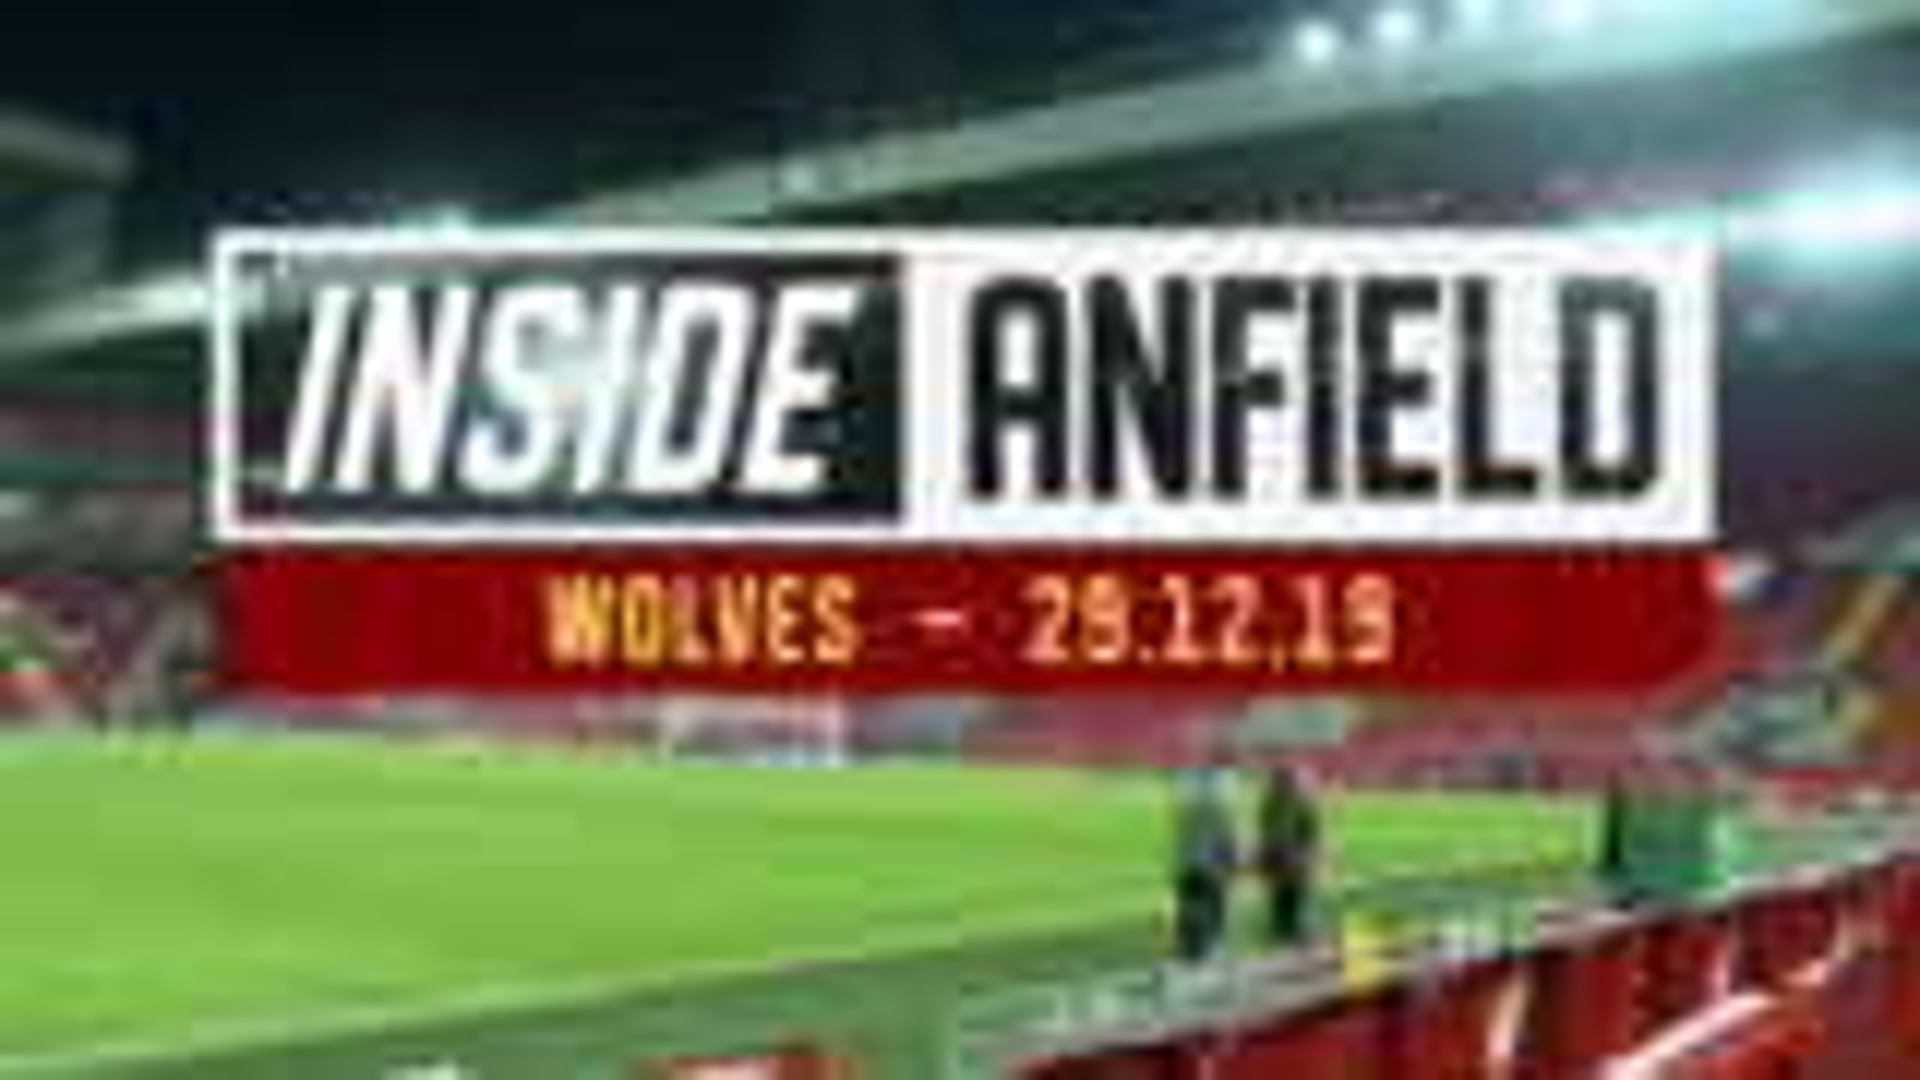 LFCTV【Inside Anfield】 - 利物浦 vs 狼队